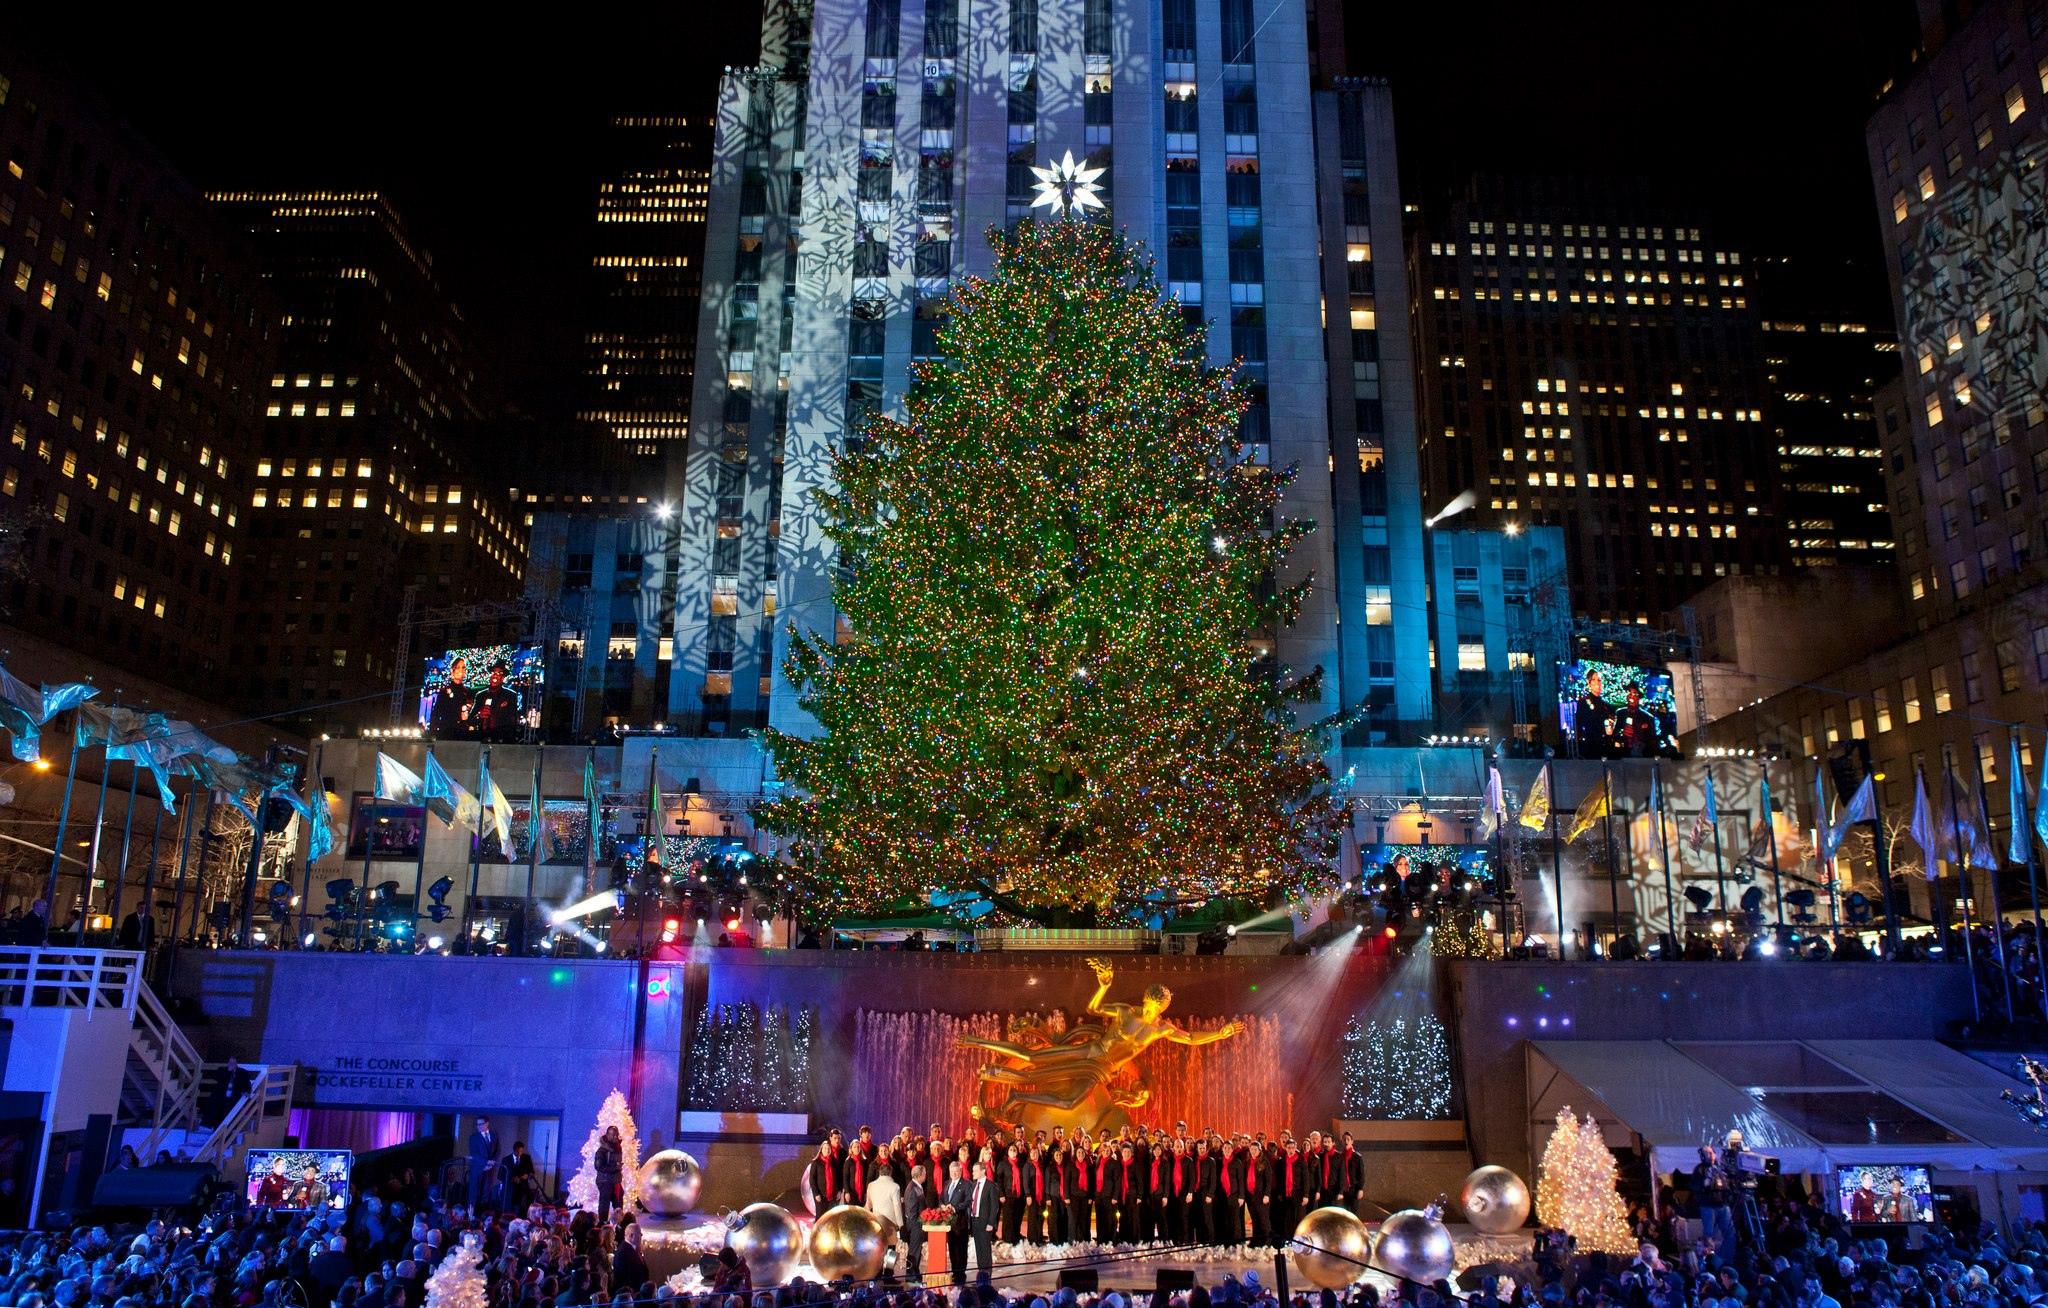 90s Christmas Lights.8 Christmas Movies That Ll Make You Feel All The New York Feels